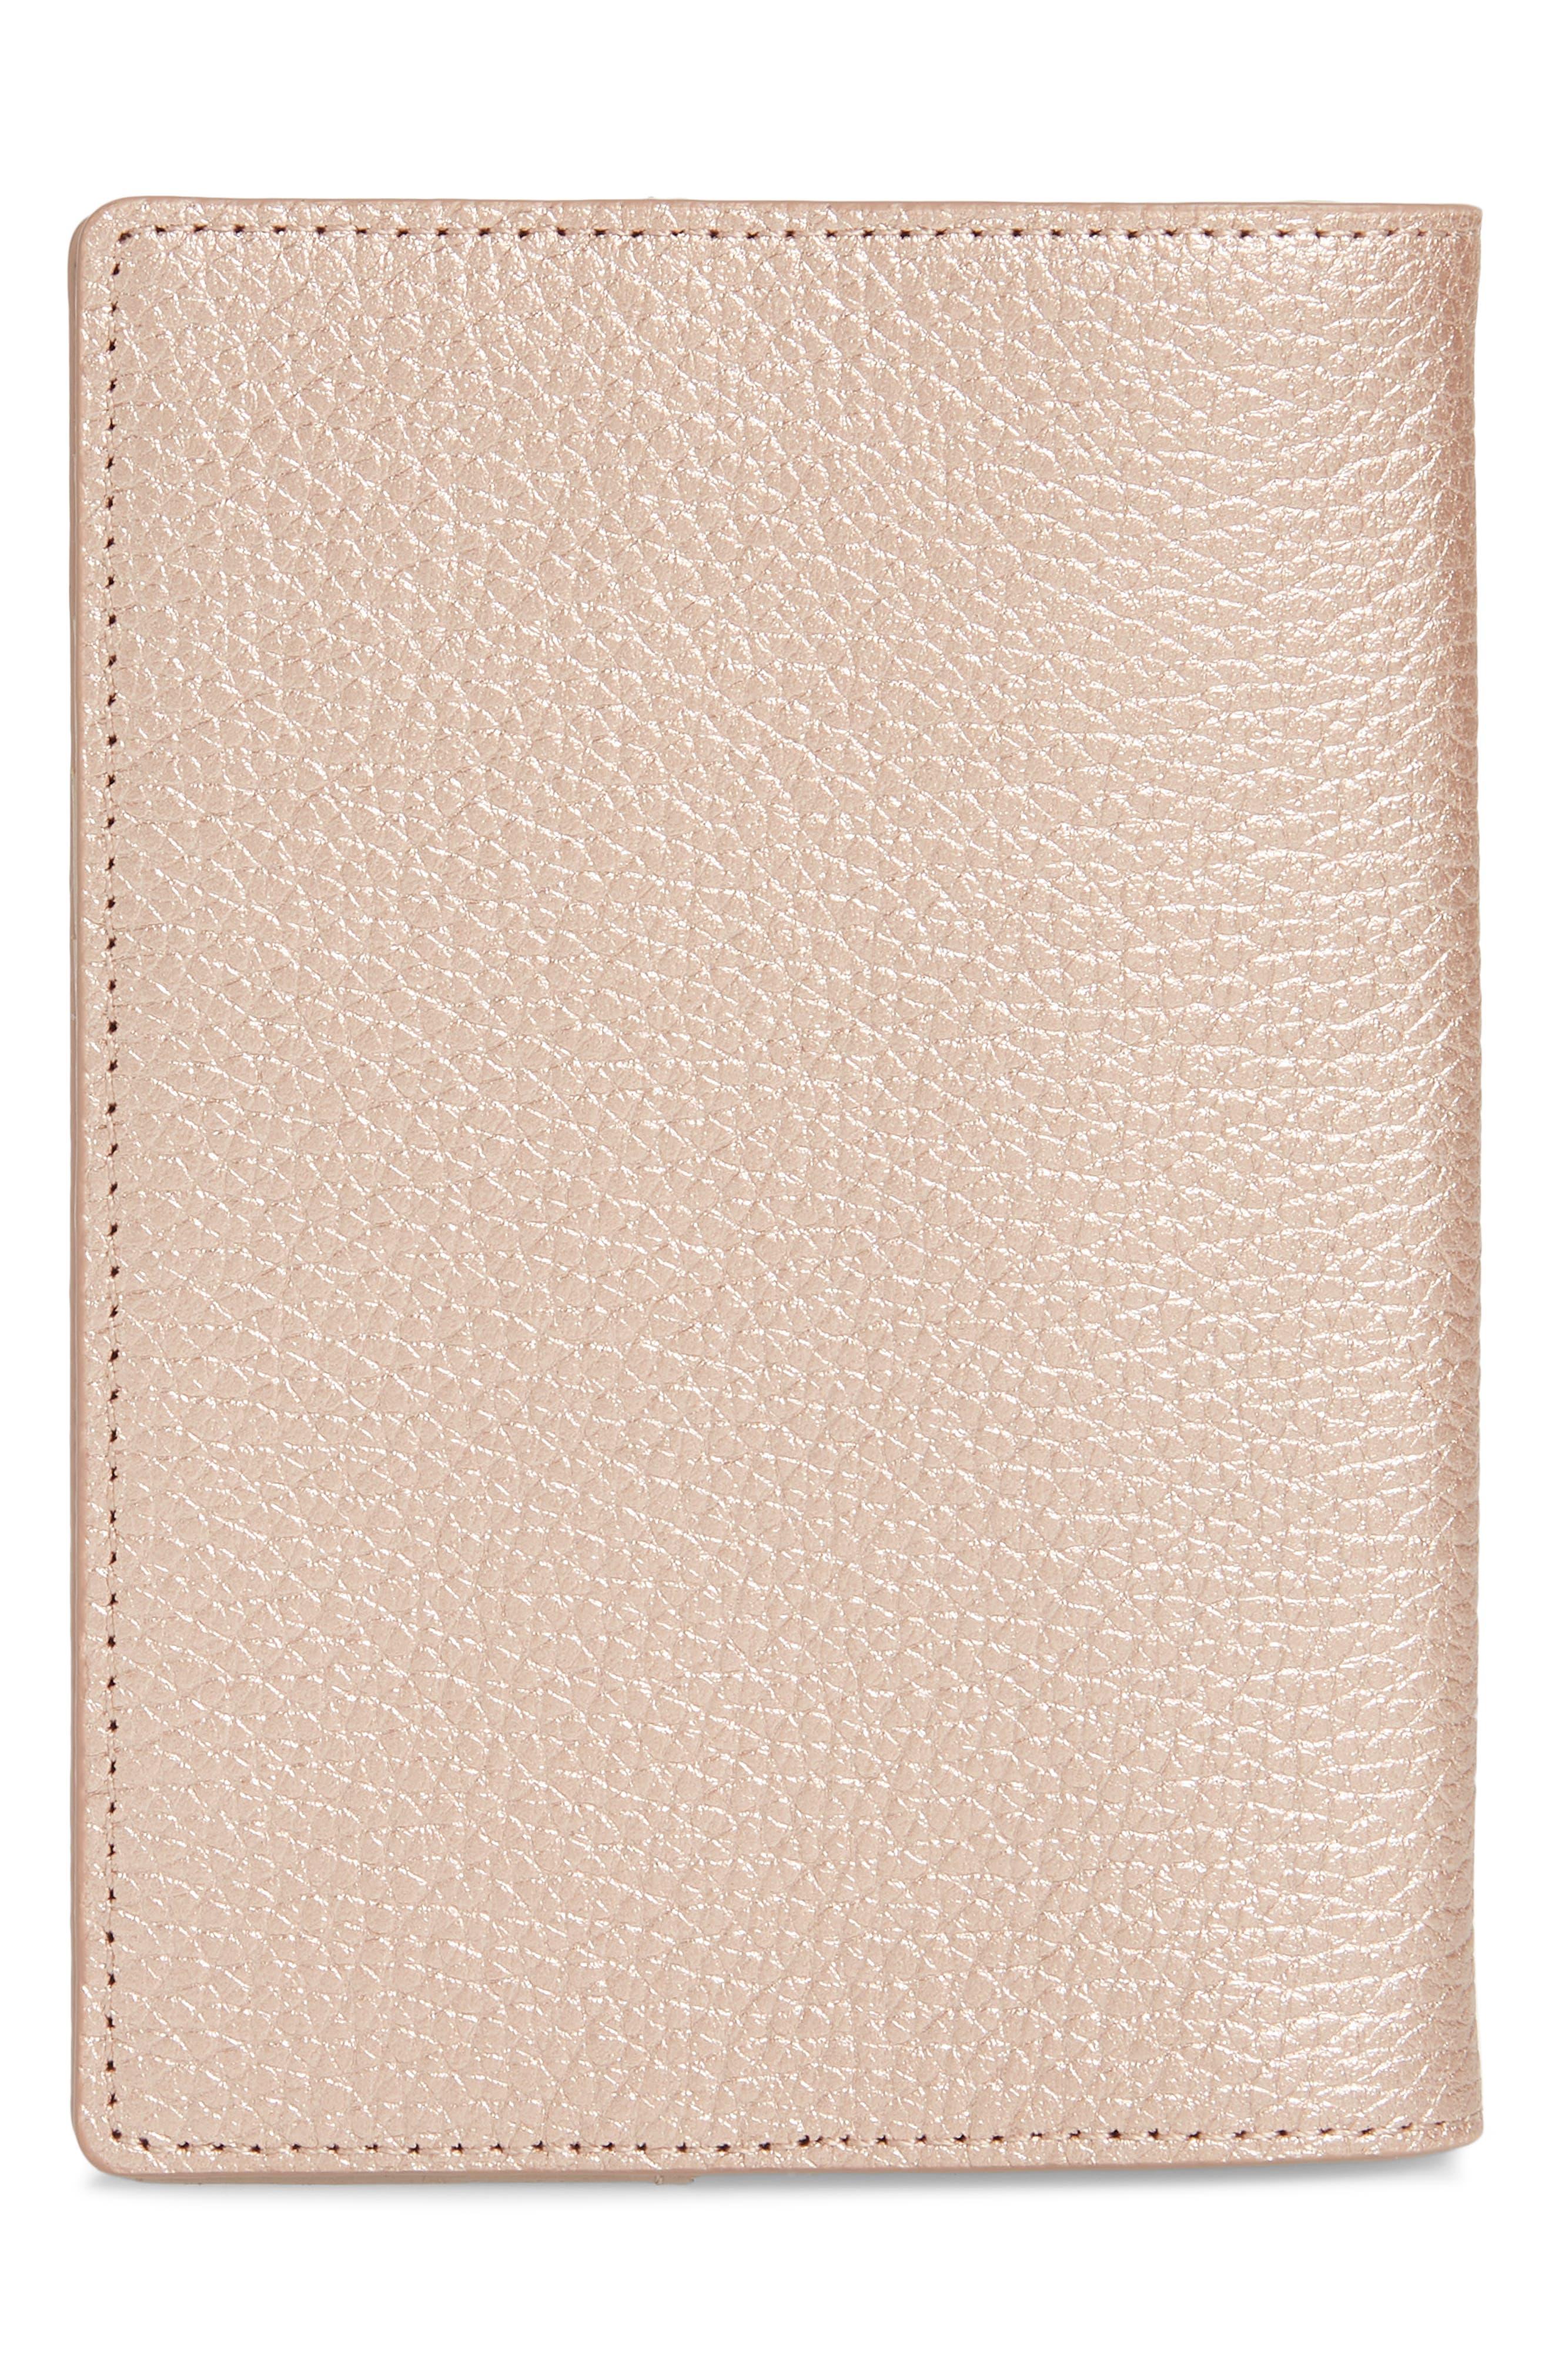 Leather Passport Case,                             Alternate thumbnail 4, color,                             ROSE GOLD